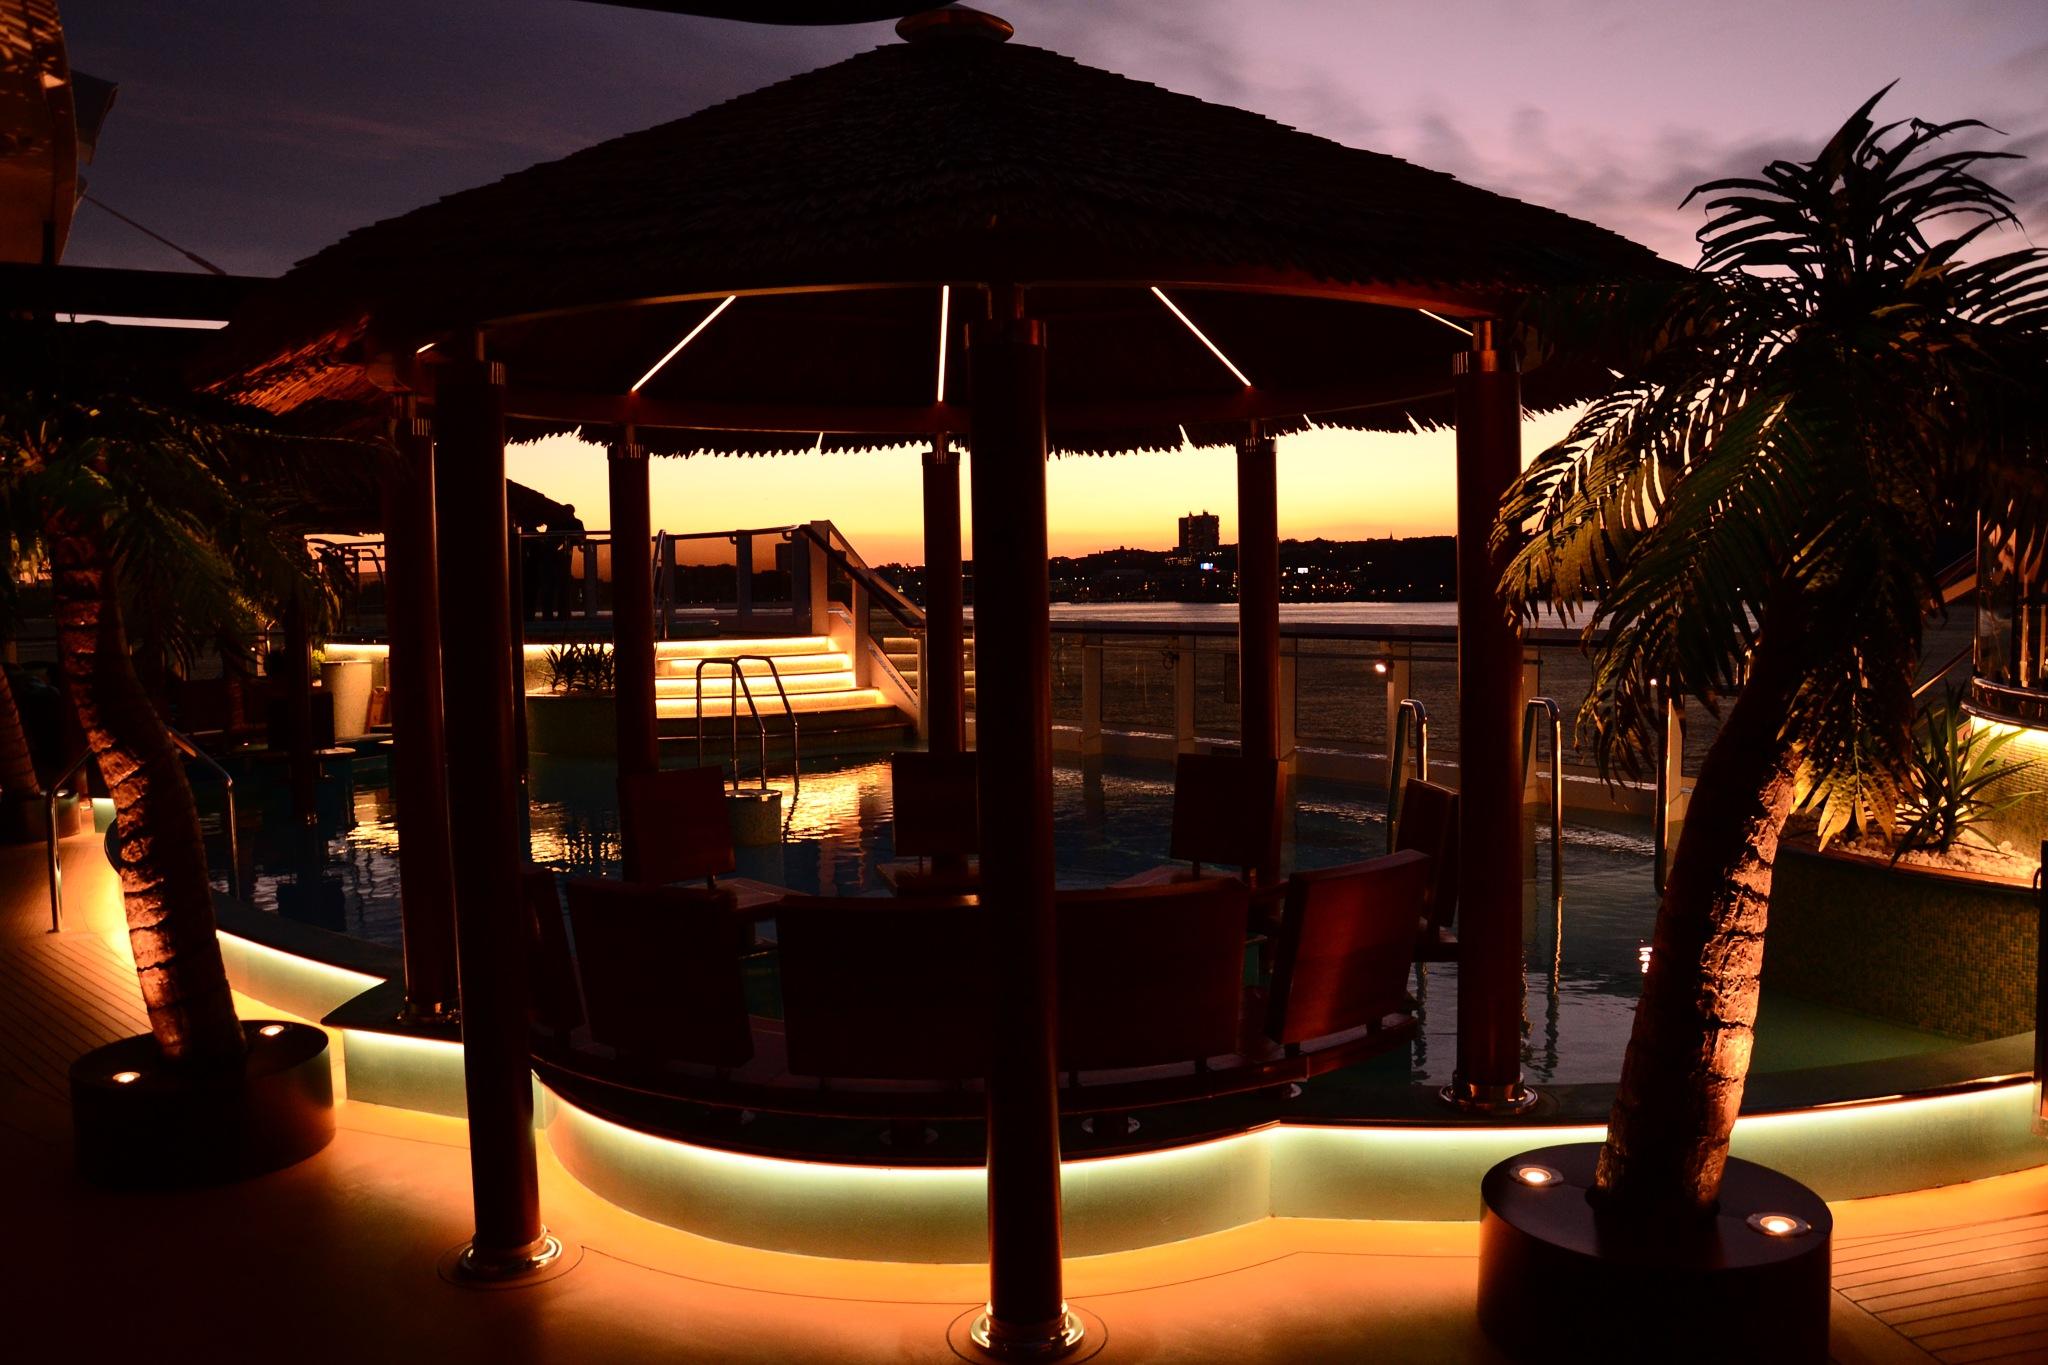 Havana pool at sunset by Phillip Triantos Triantafillou